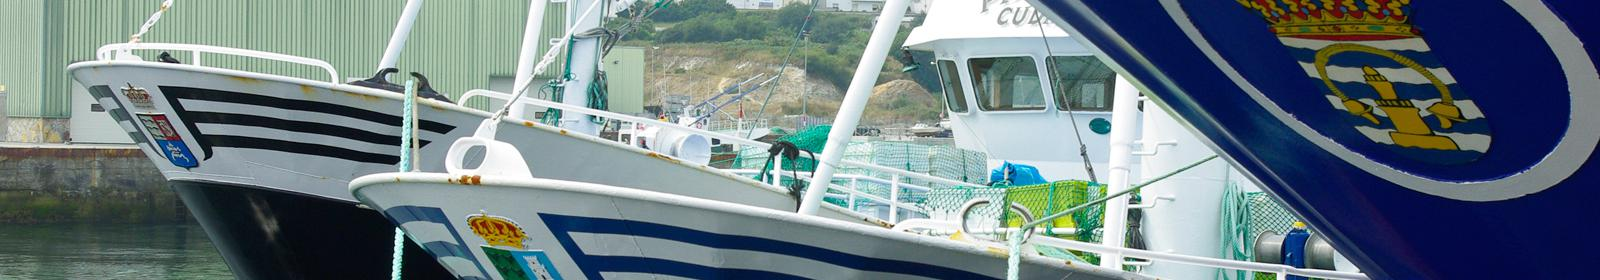 Portos mariñeiros